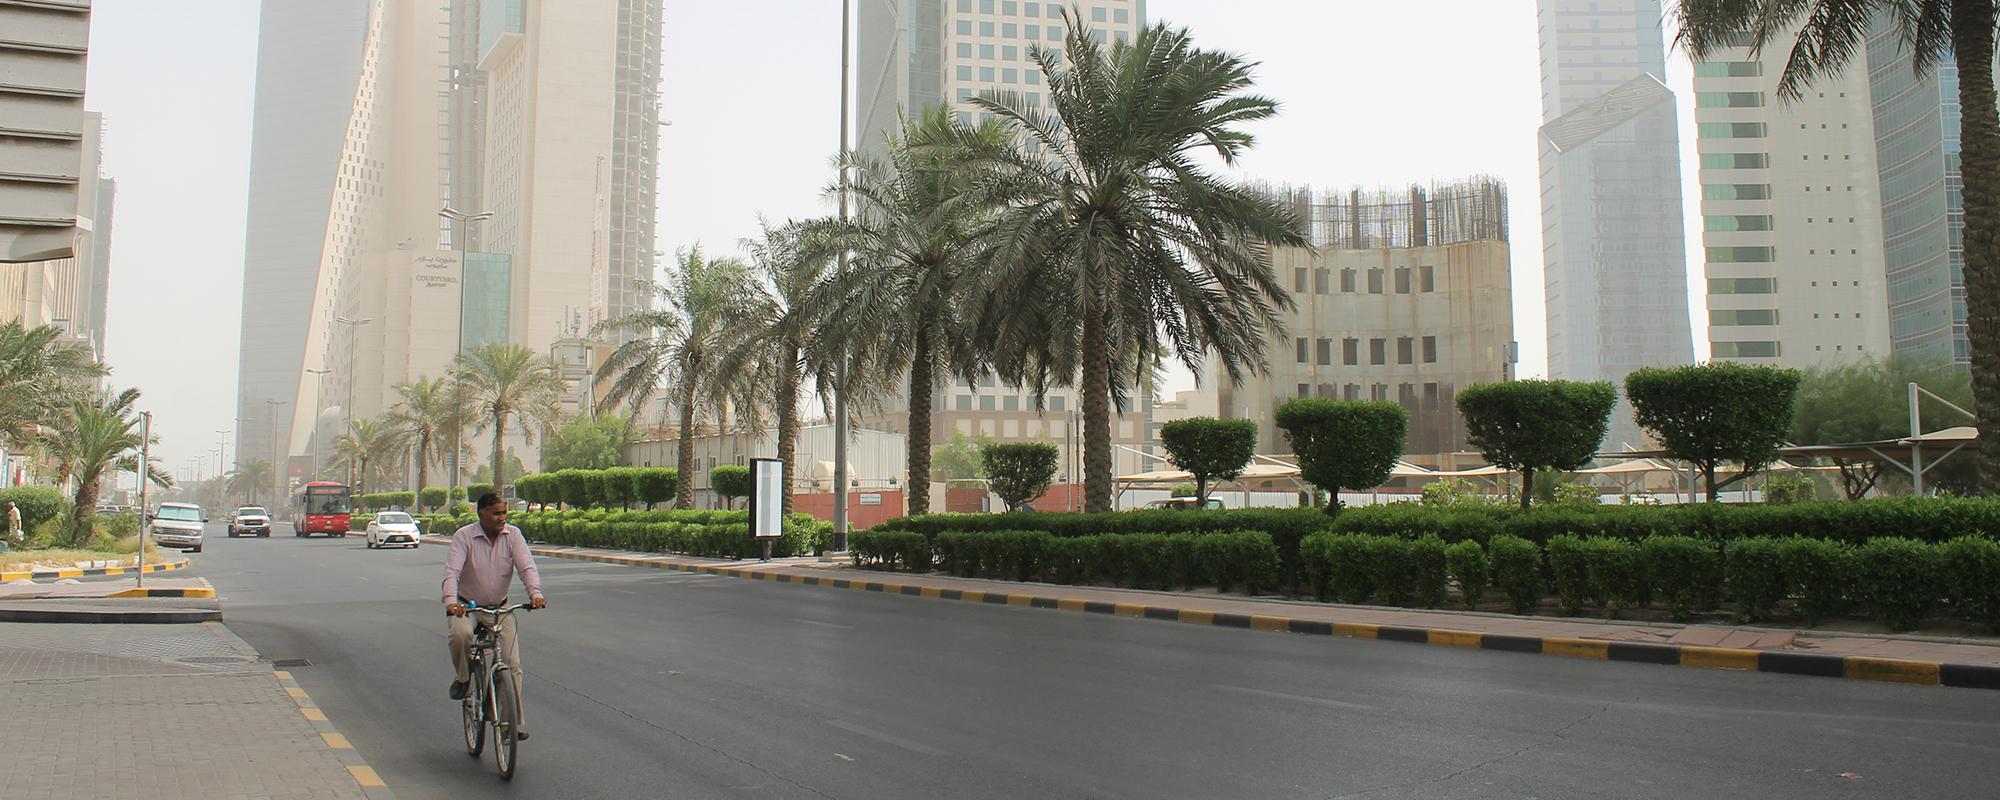 Public-Space-Kuwait-banner-2